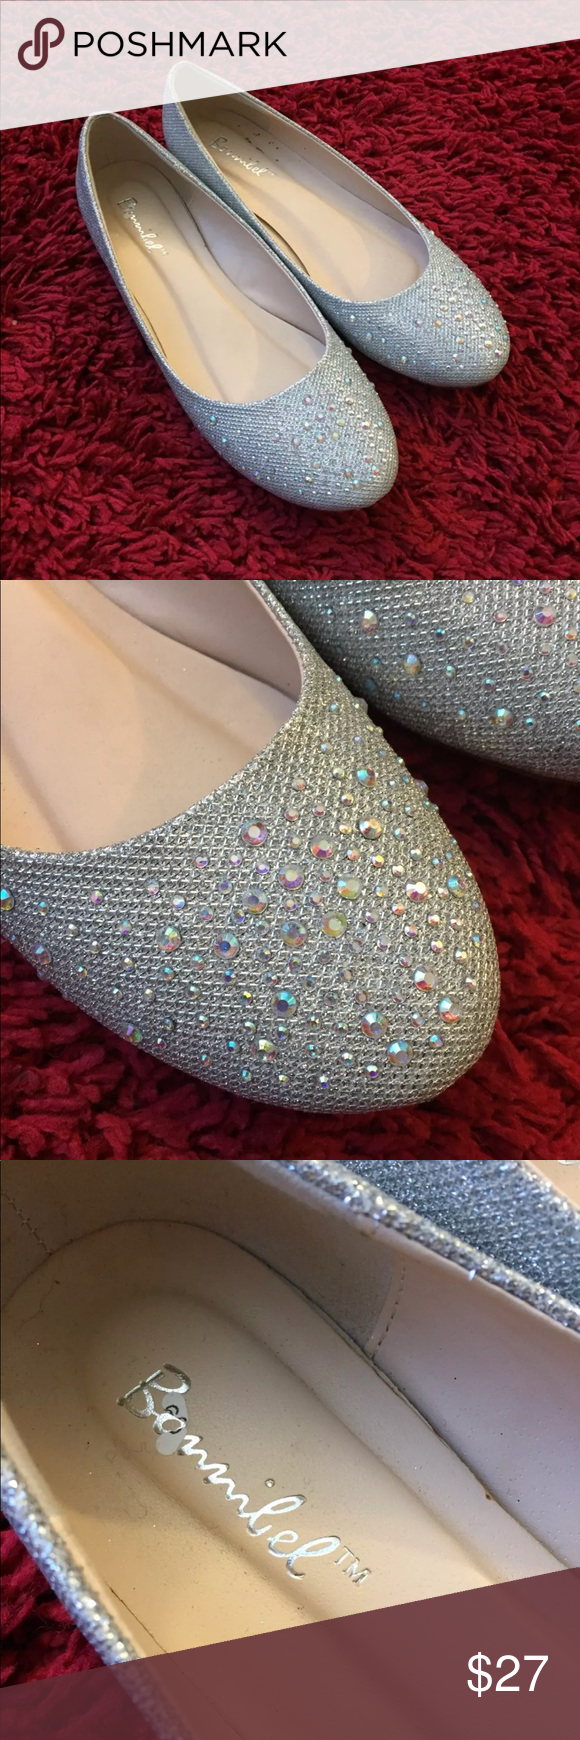 10117865f Bonnibel silver rhinestone flats wedding shoes Women's Bonnibel flats Size  8.5 Silver Rhinestones on toes These